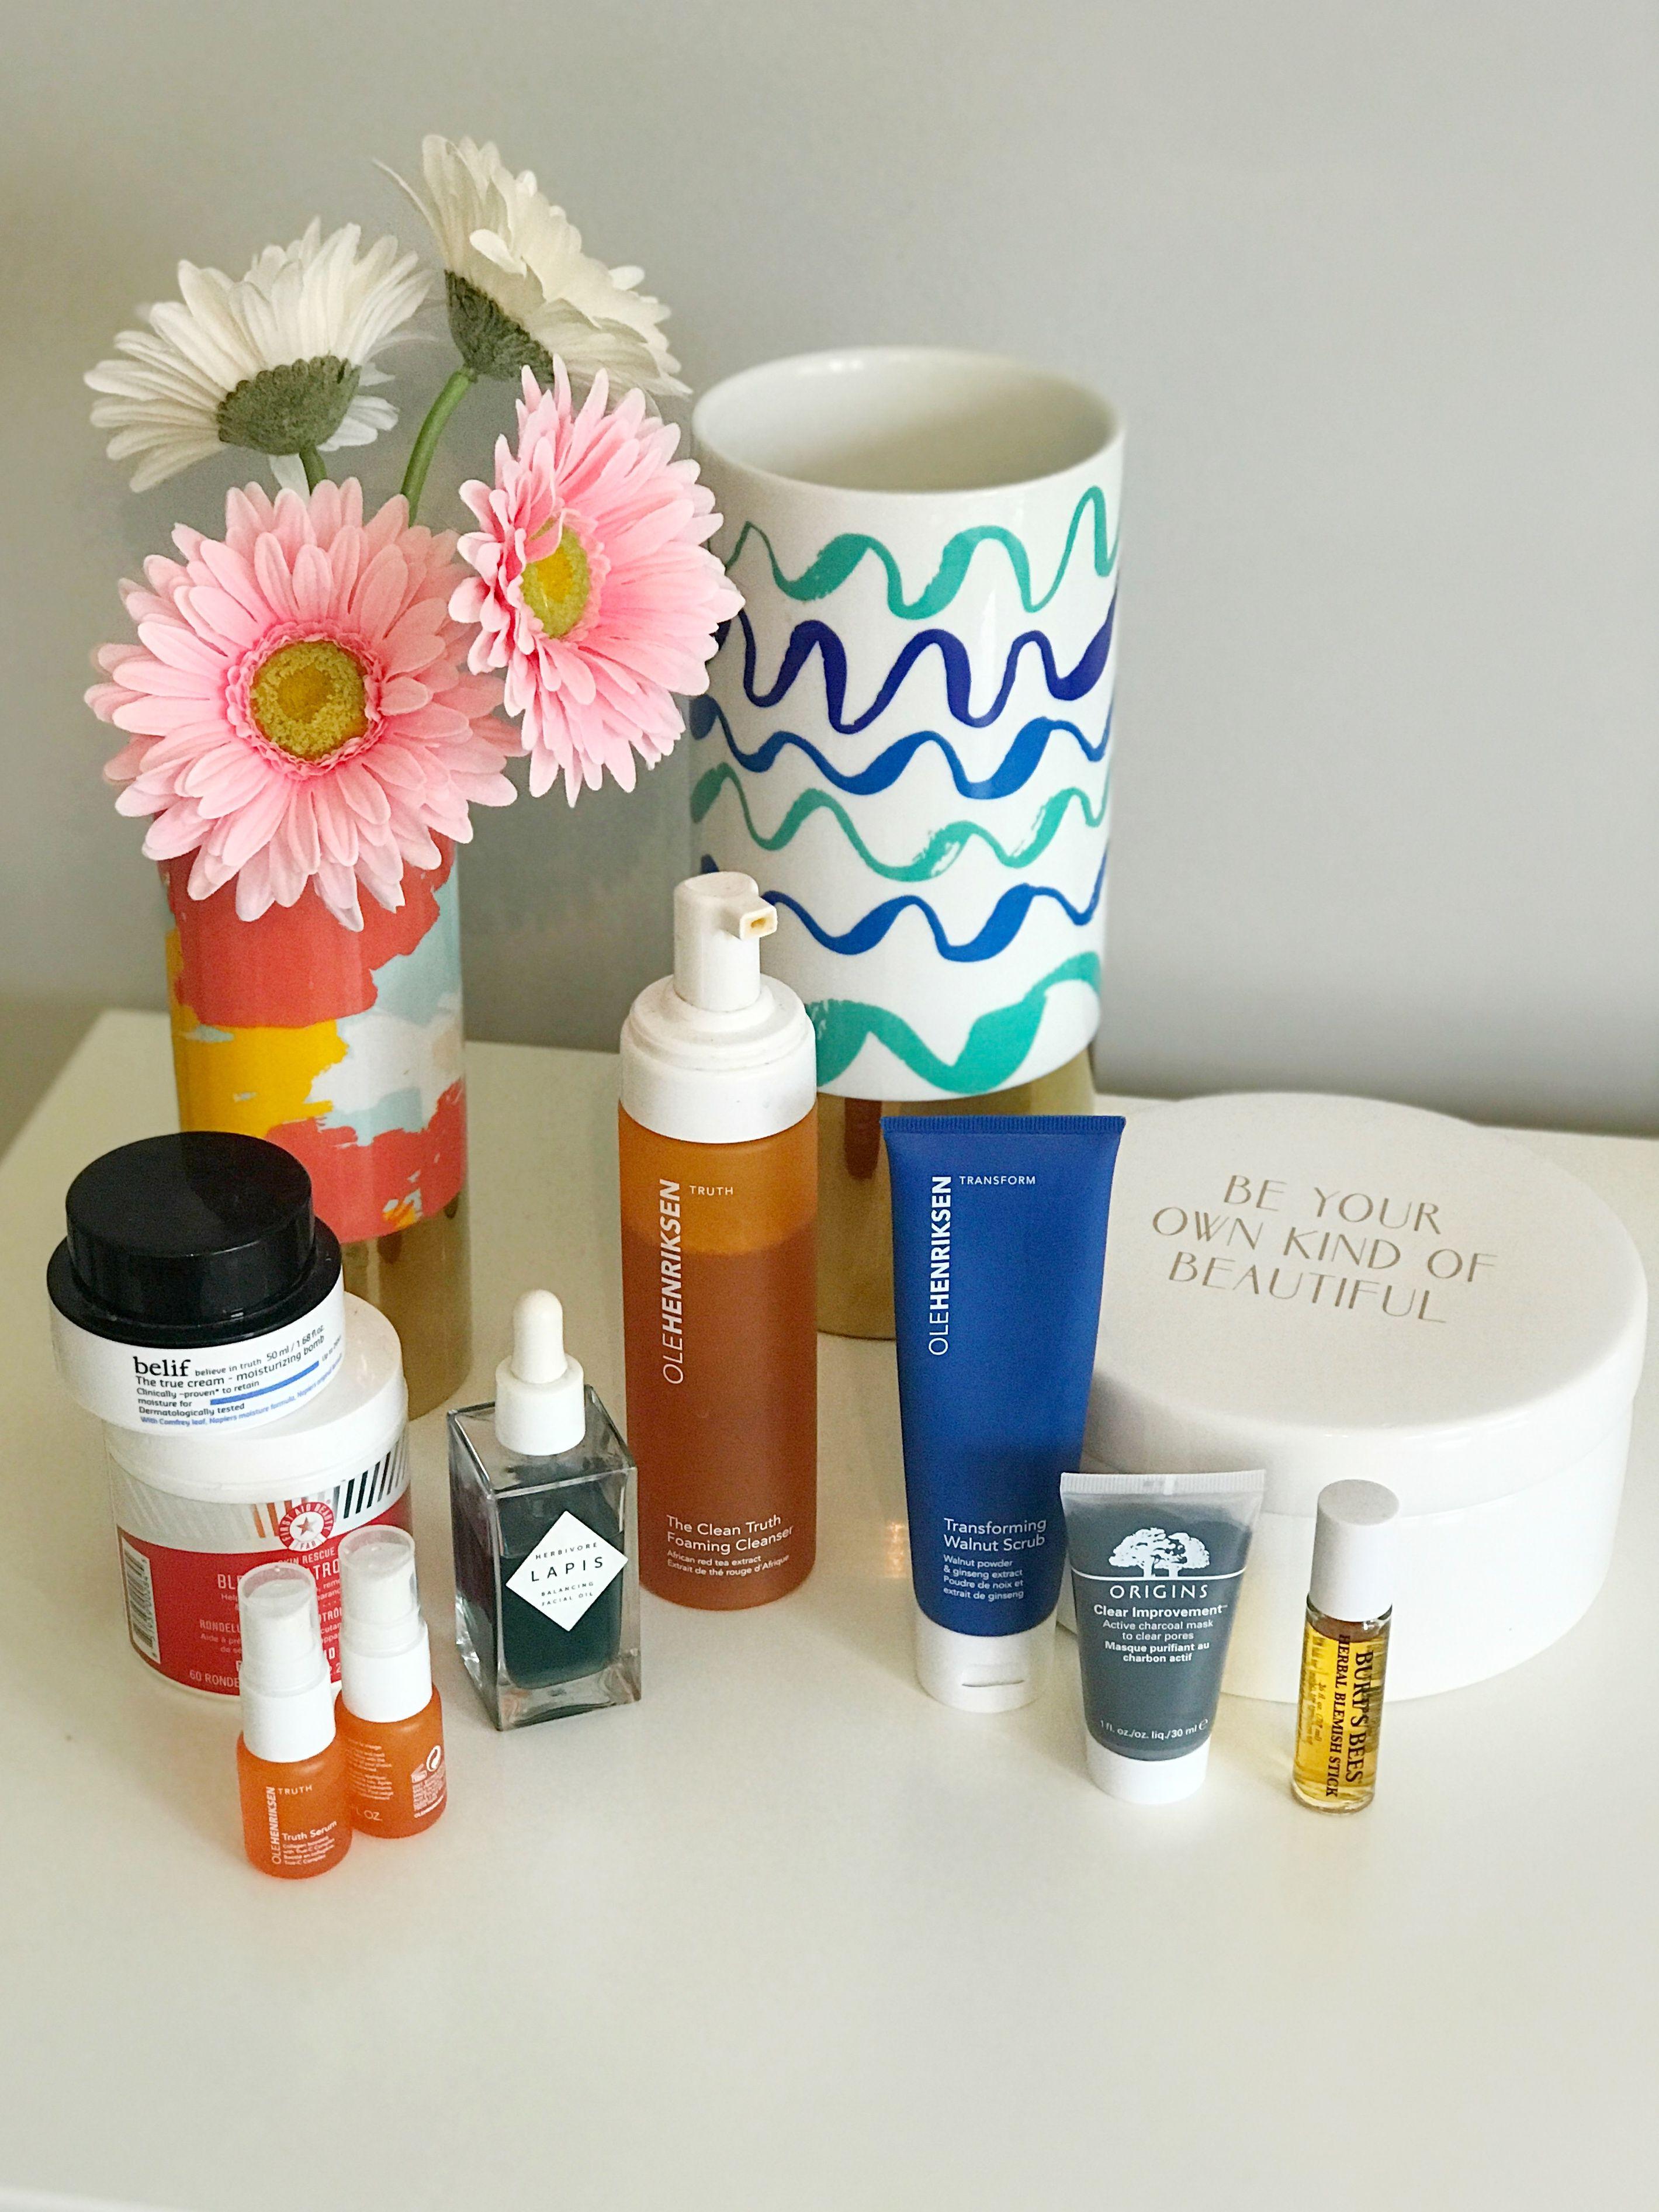 Pcos Acne Hormonal Acne Skincare Skin Care Routine Acne Routine Beauty Winter Skin Care Organic Skin Care Diy Acne Treatment